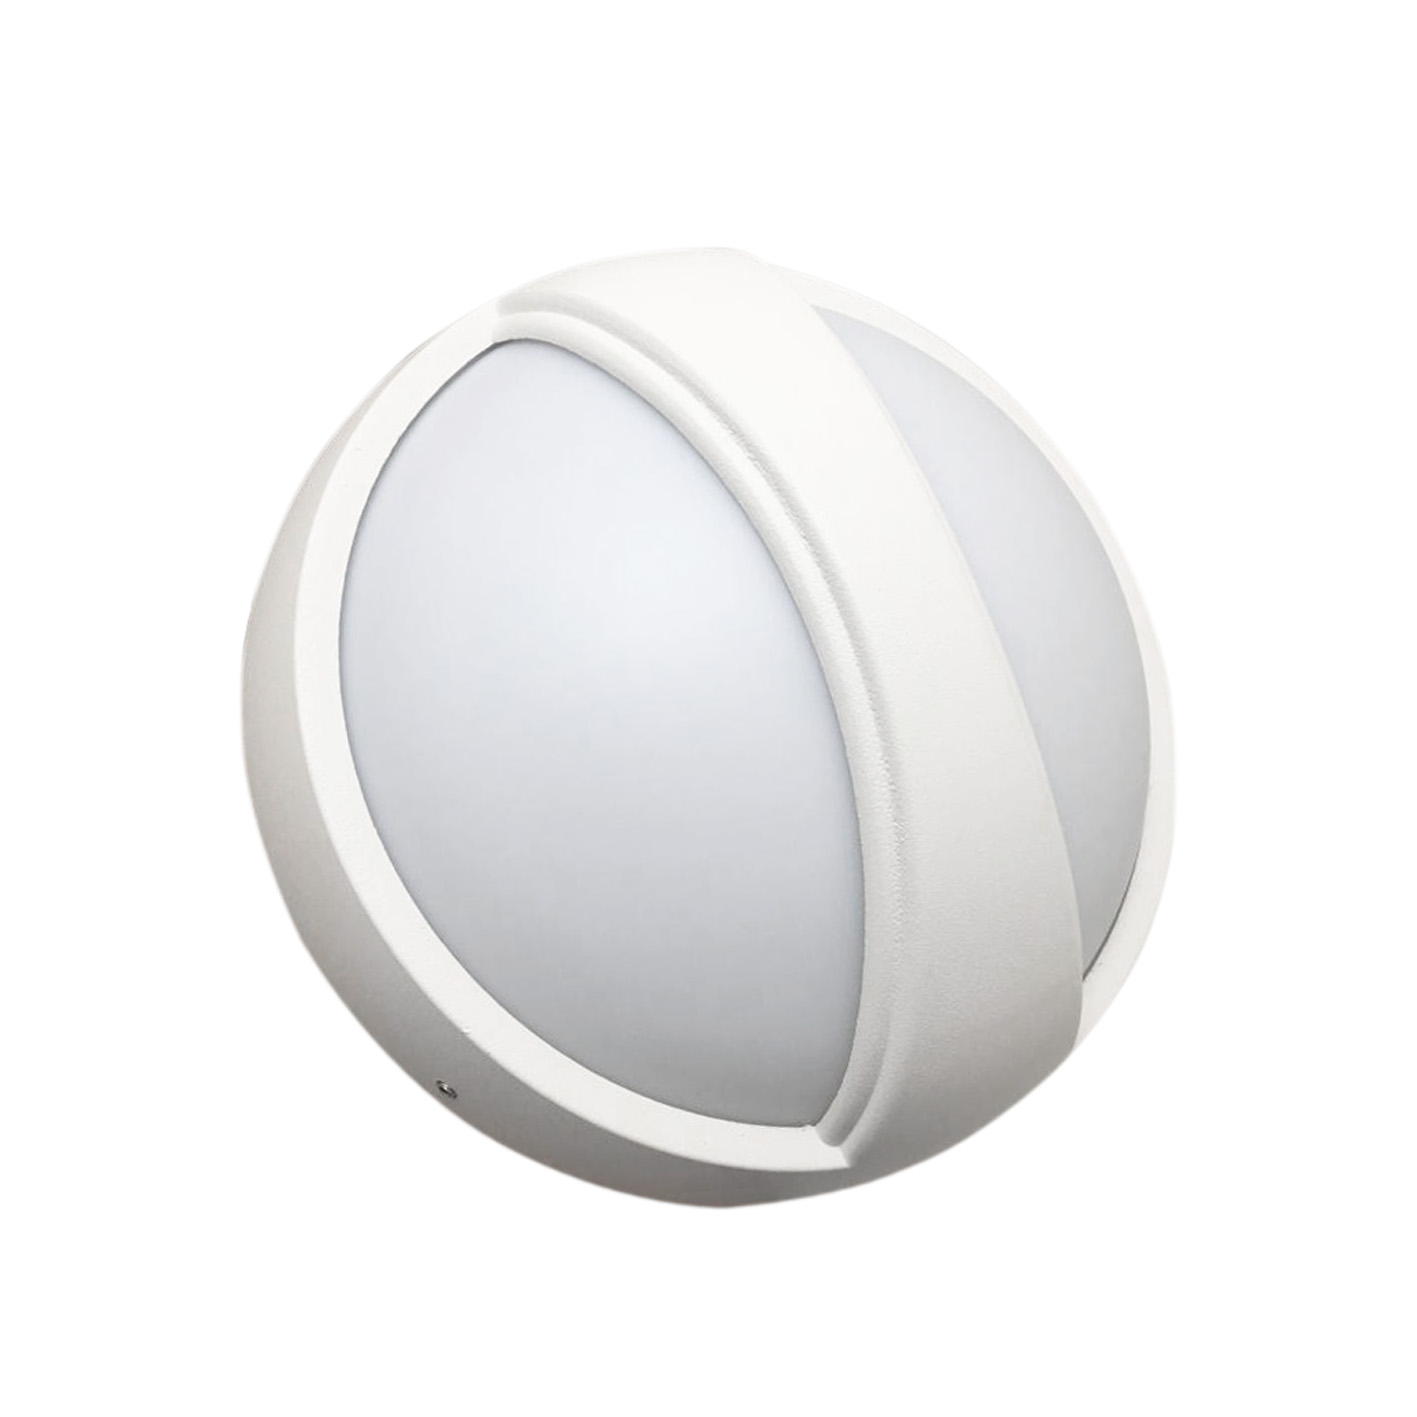 Tipi Di Lampade A Led.Lampada Led 15w Applique Da Parete Semisfera Ufo Per Interni B78 15w